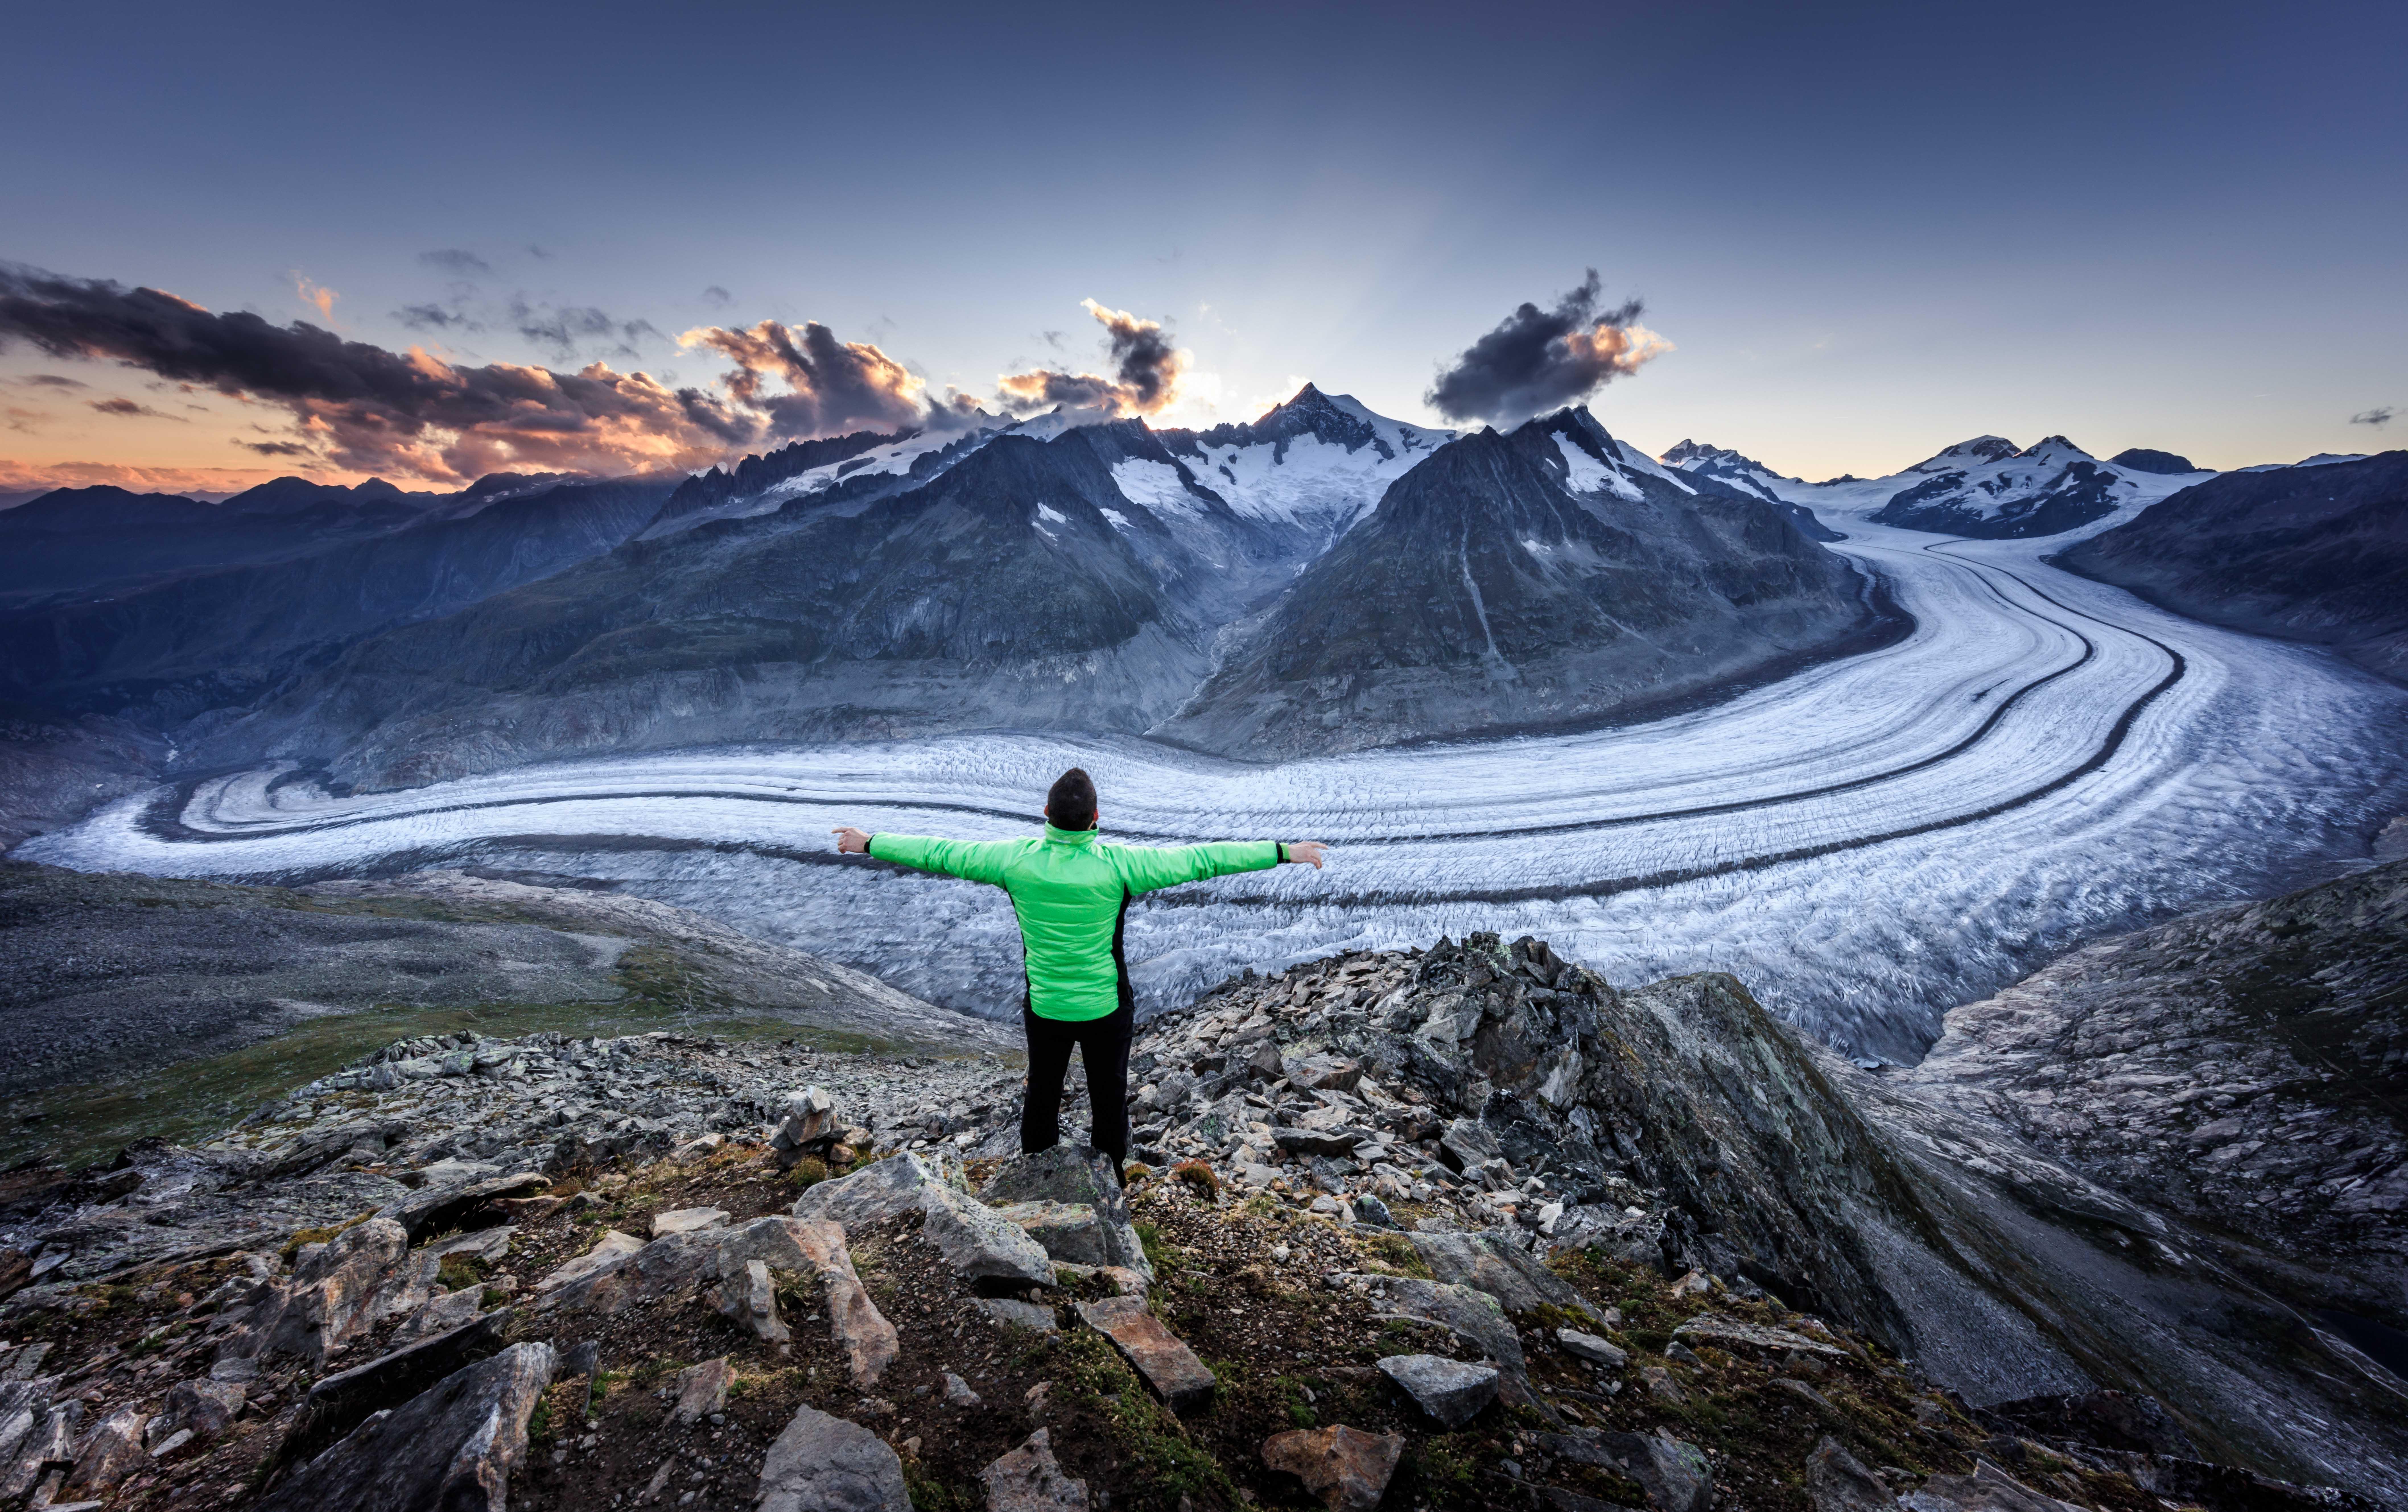 Balade panoramique en Suisse - Grand glacier d'Aletsch - Circuit d'Eggishorn